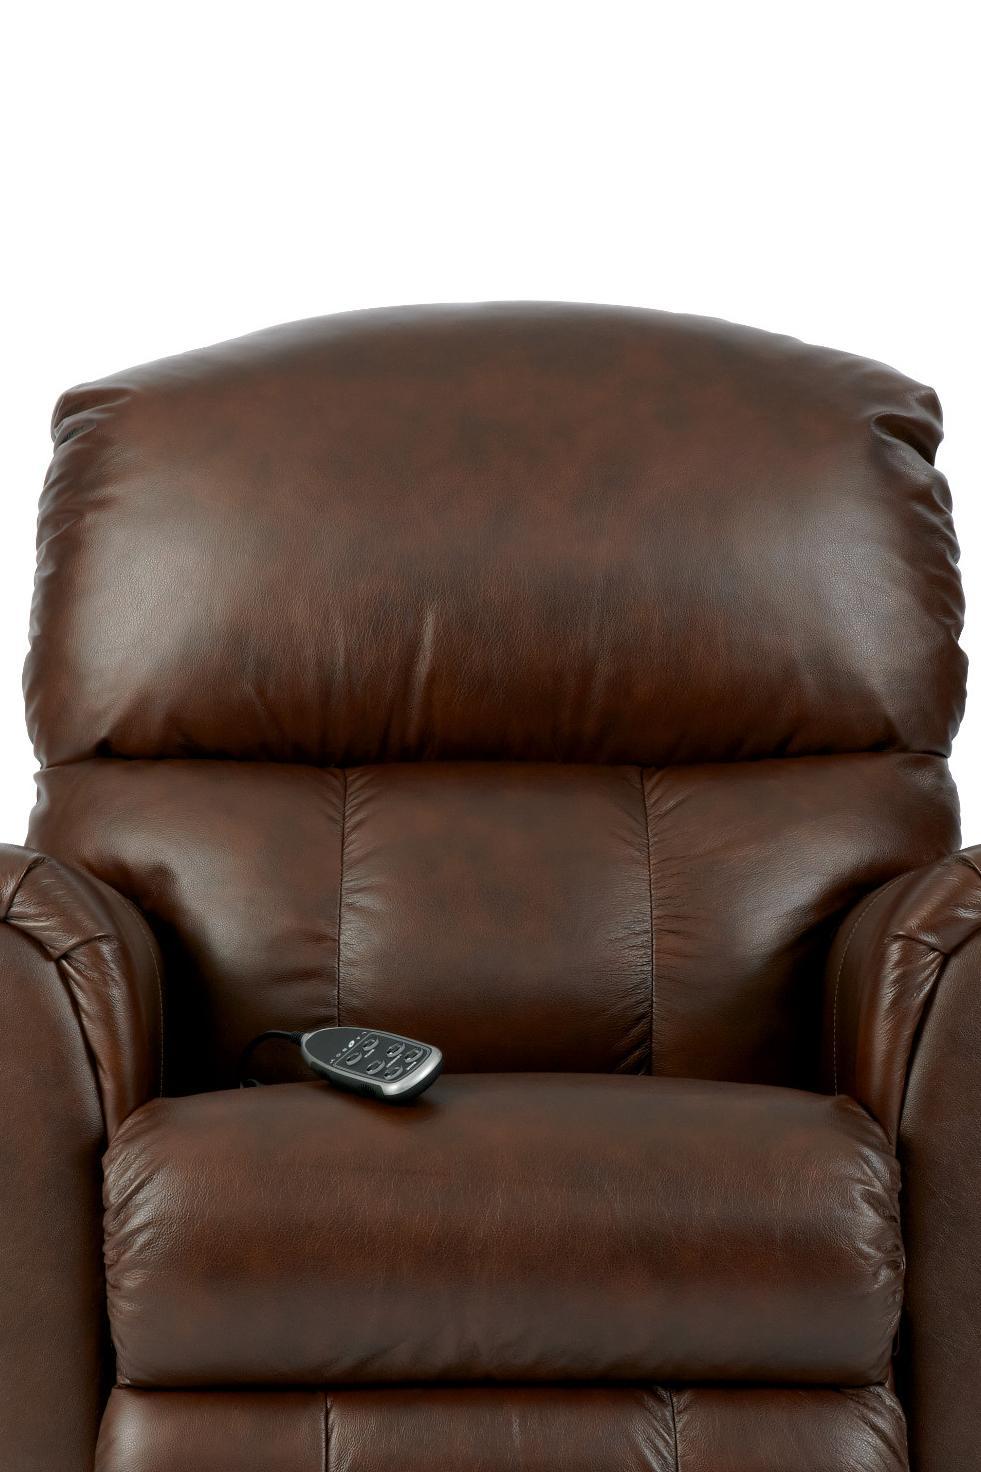 Outstanding Briggs 701 By La Z Boy Conlins Furniture La Z Boy Bralicious Painted Fabric Chair Ideas Braliciousco